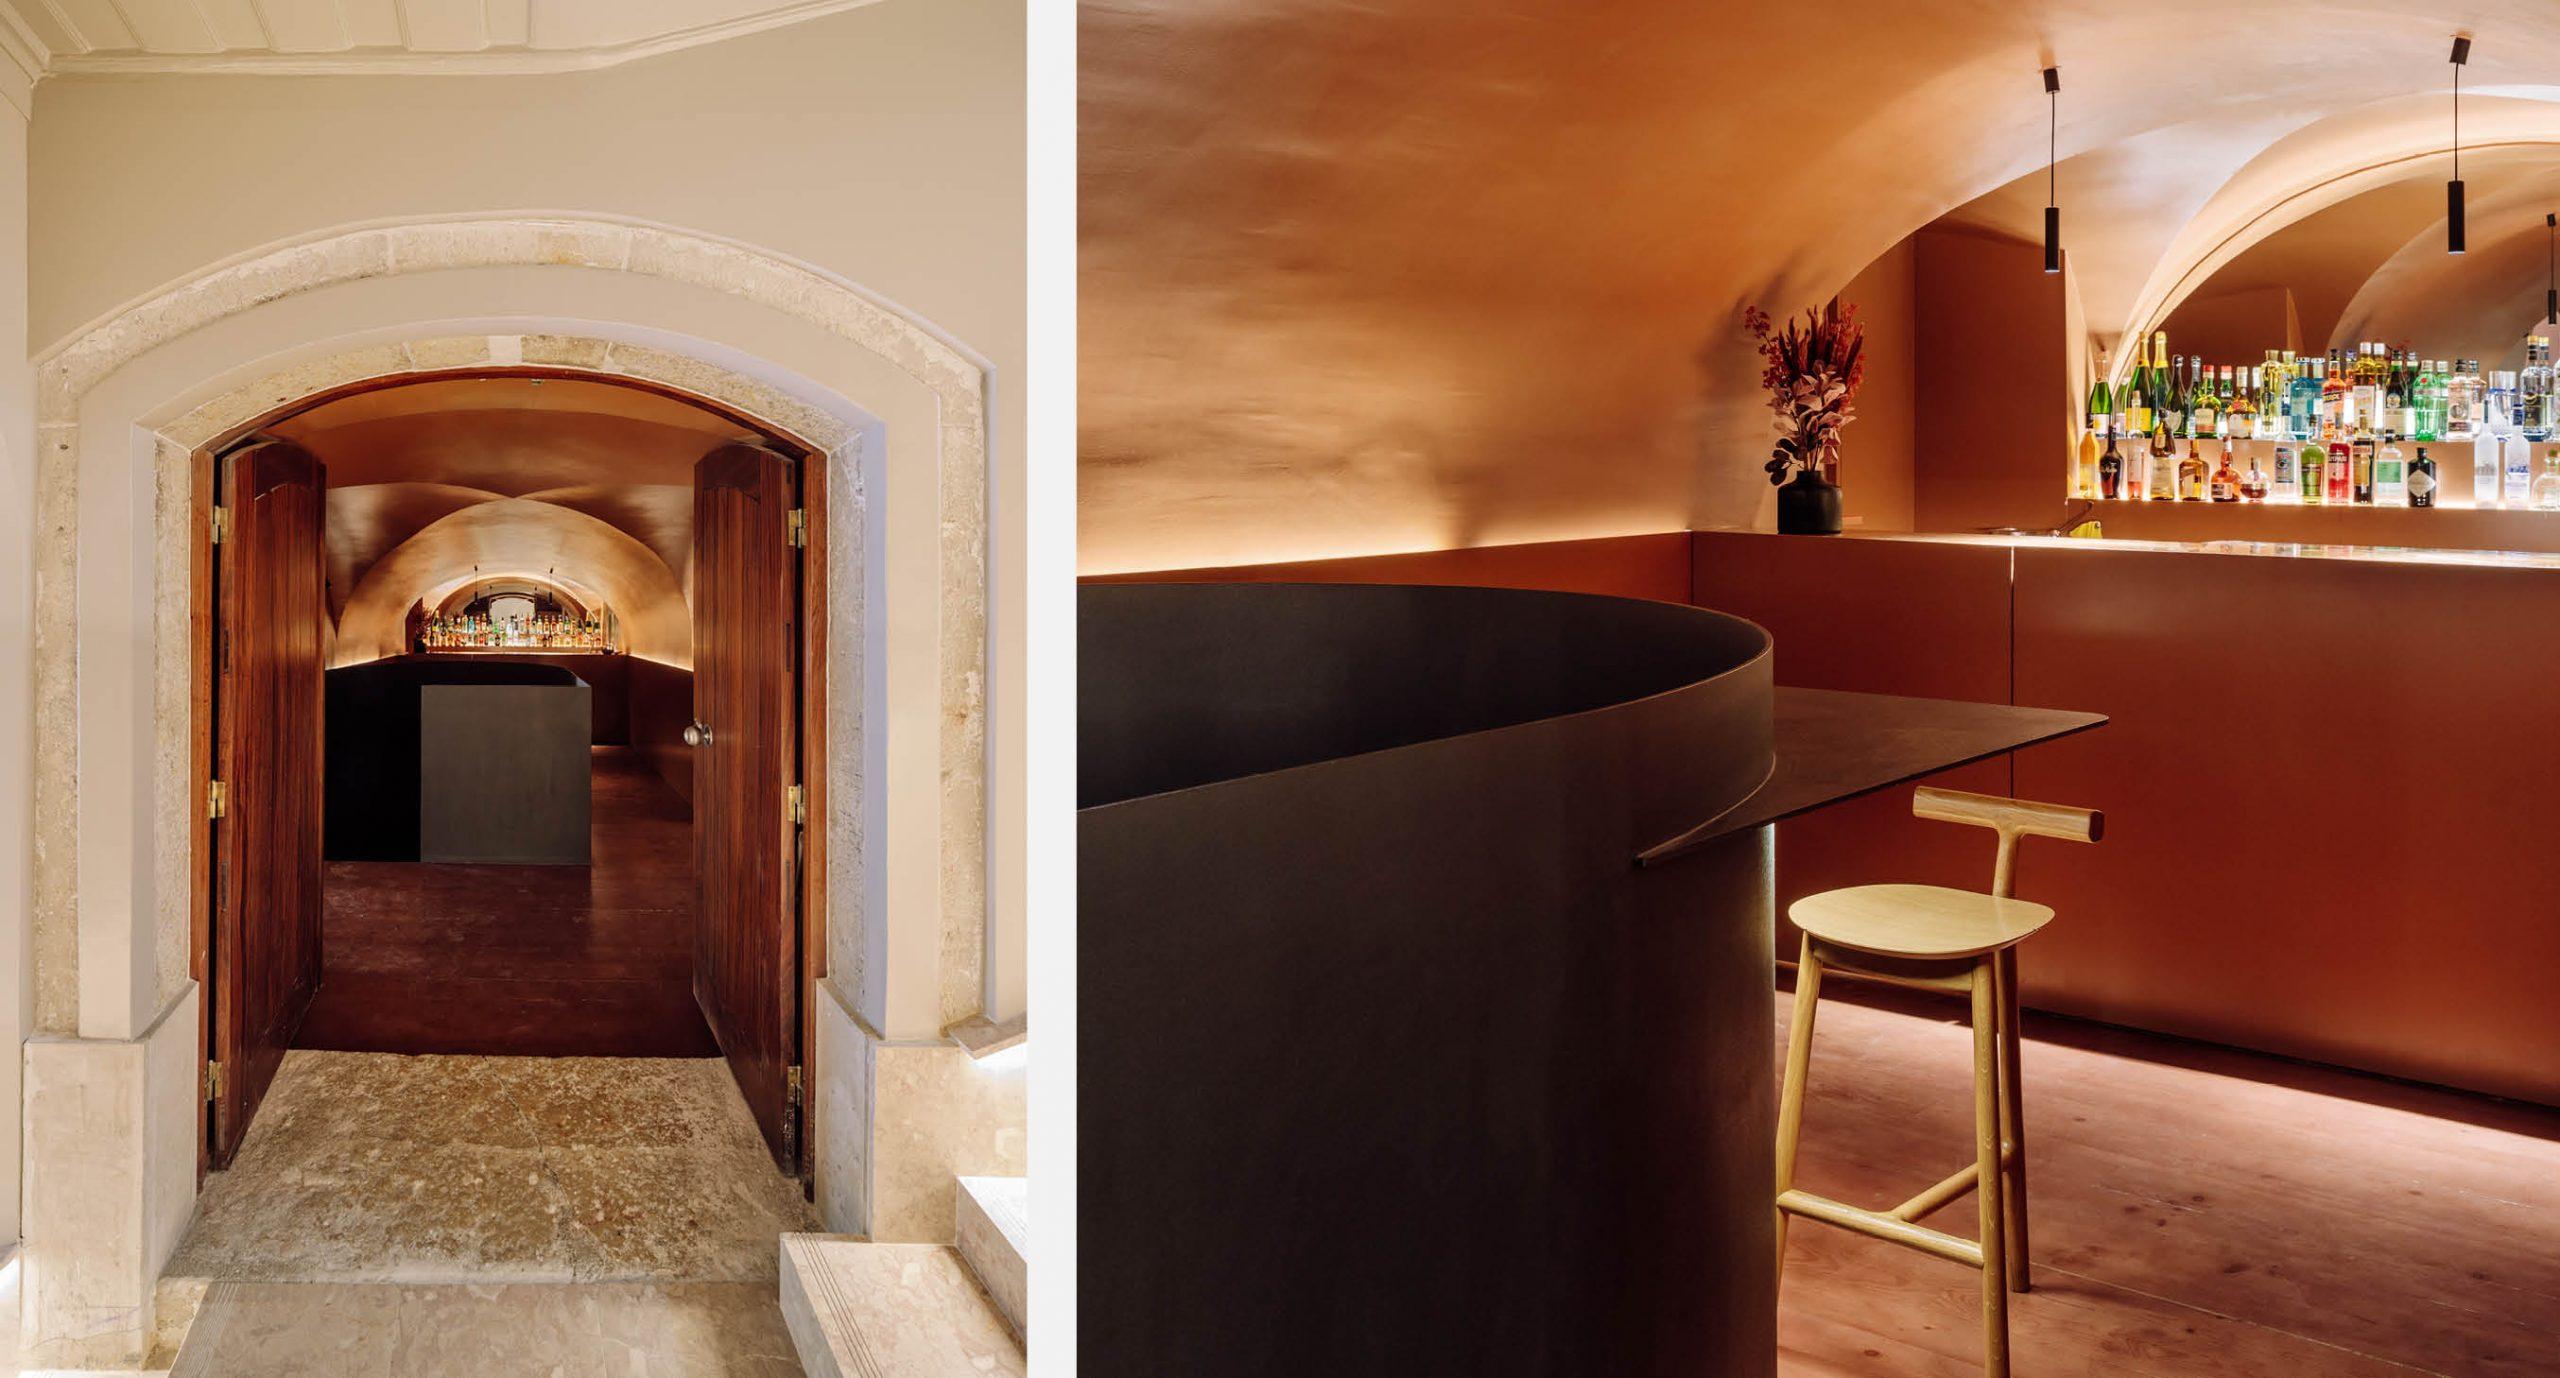 Spacegram_Nomada_Restaurant_Red_WoodPanels_CNC_Instalation_Gold_Neon_Bar_29